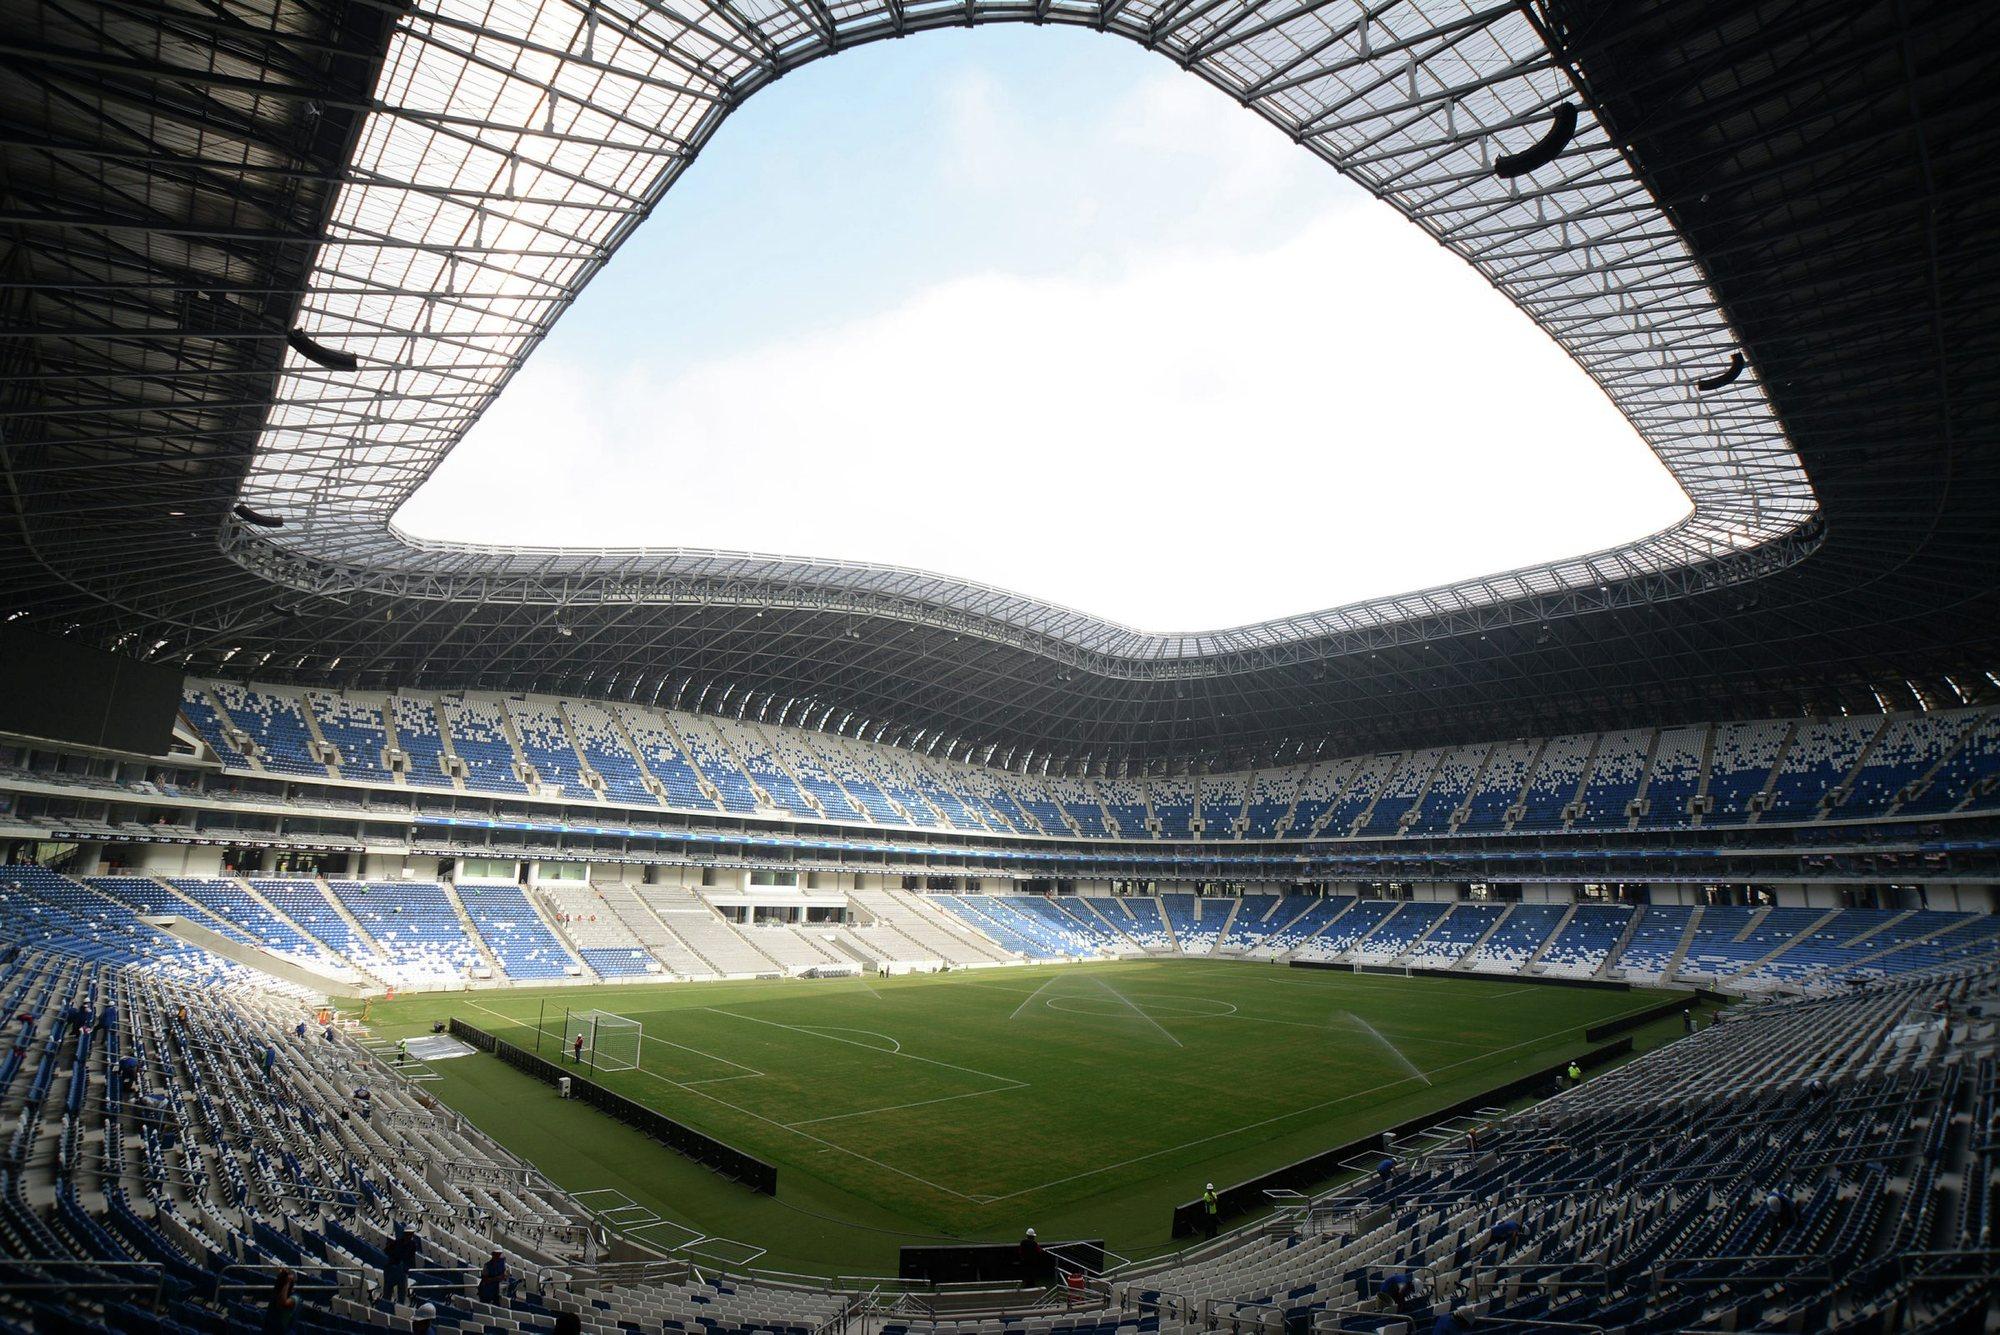 Bancomer: Gallery Of BBVA BANCOMER Stadium / Populous